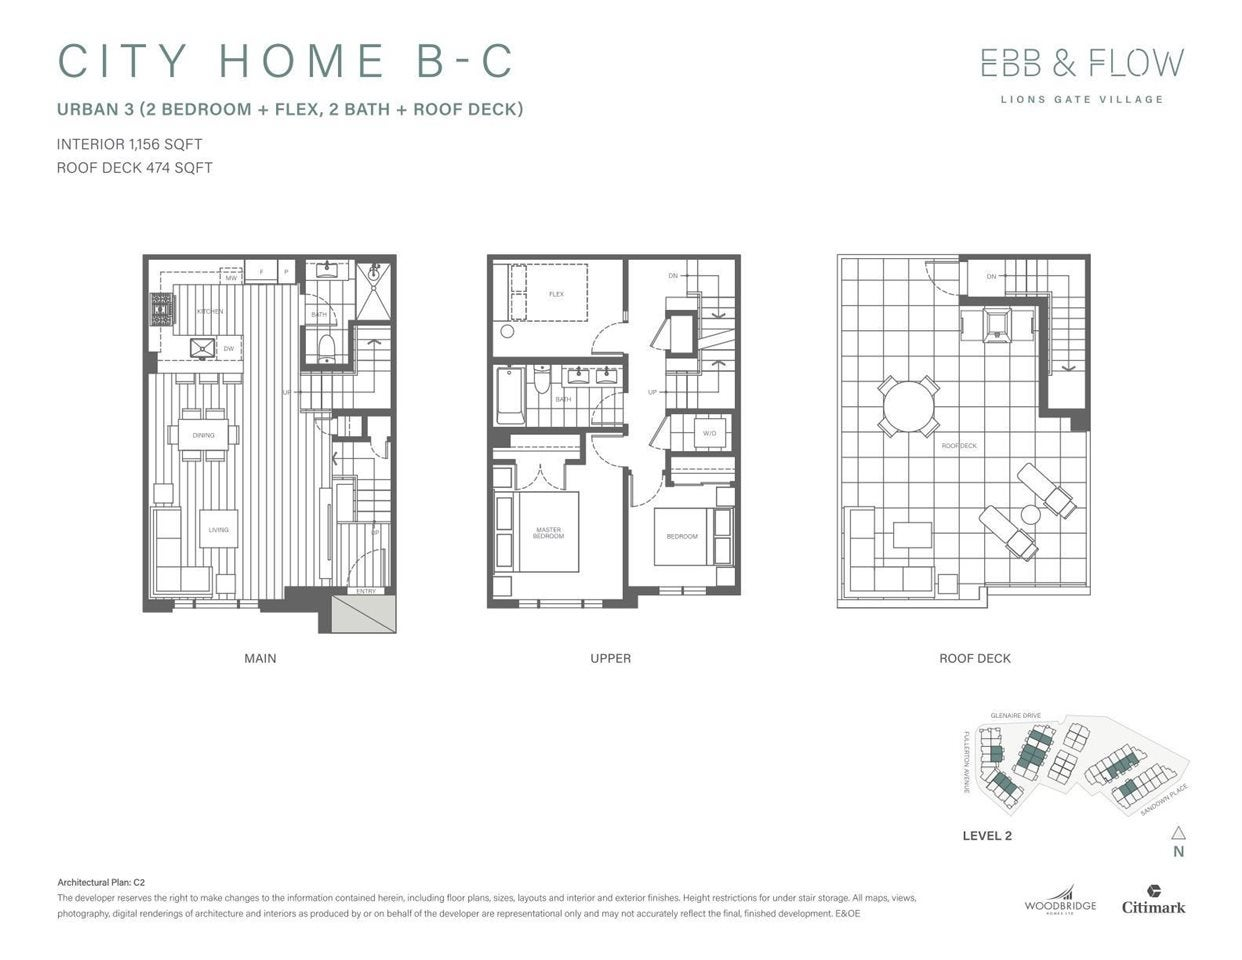 267 2035 GLENAIRE DRIVE - Pemberton NV Townhouse for sale, 2 Bedrooms (R2591056) - #11